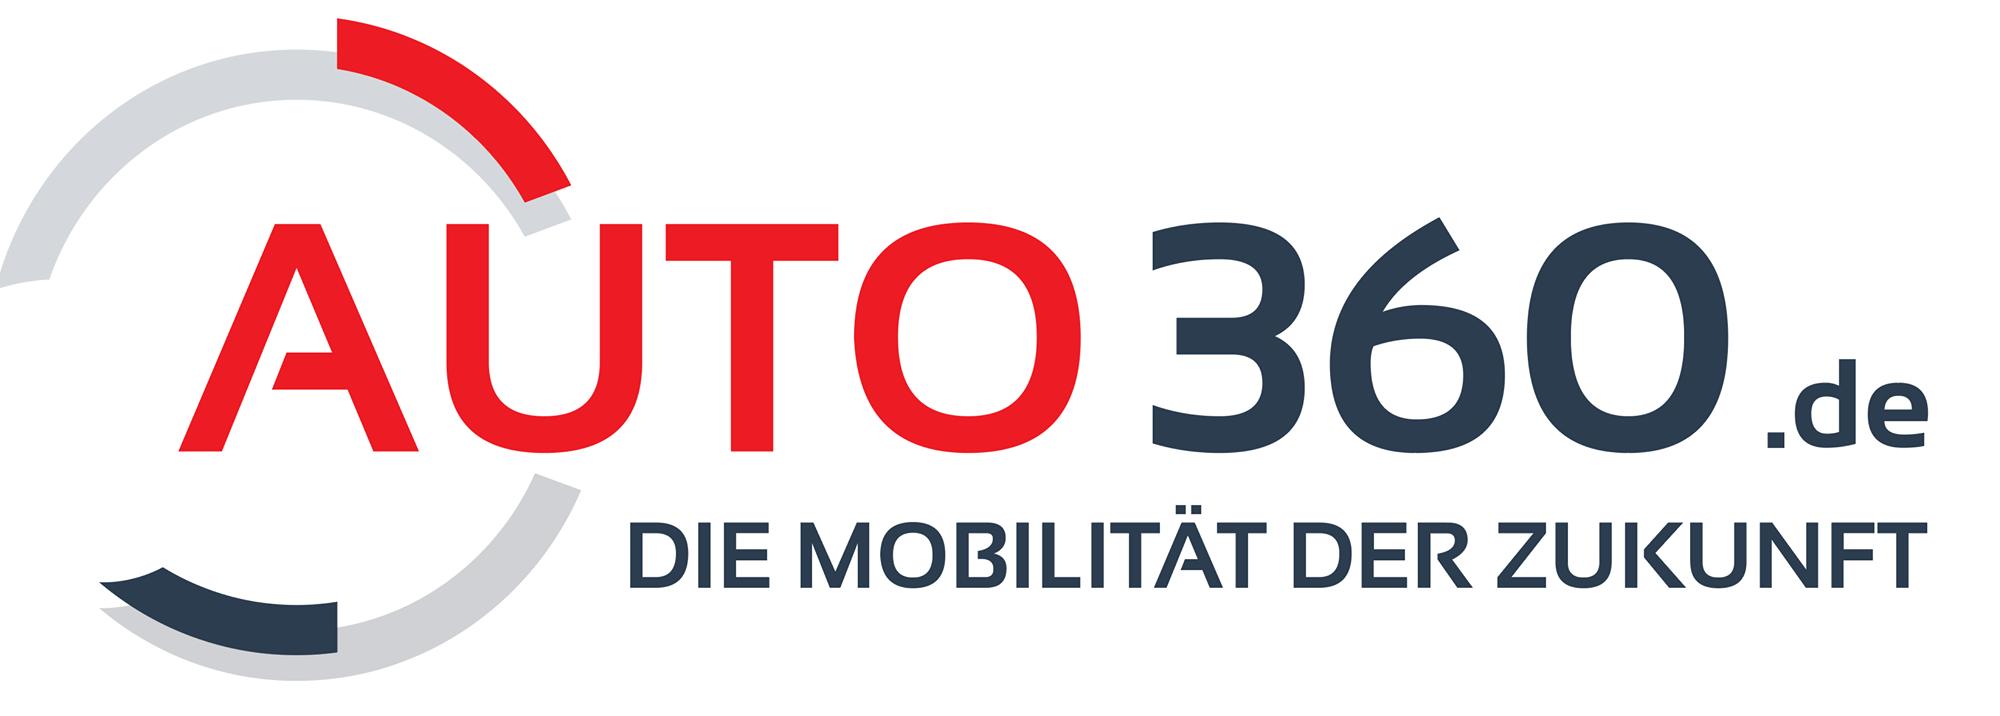 Auto360.de Logo